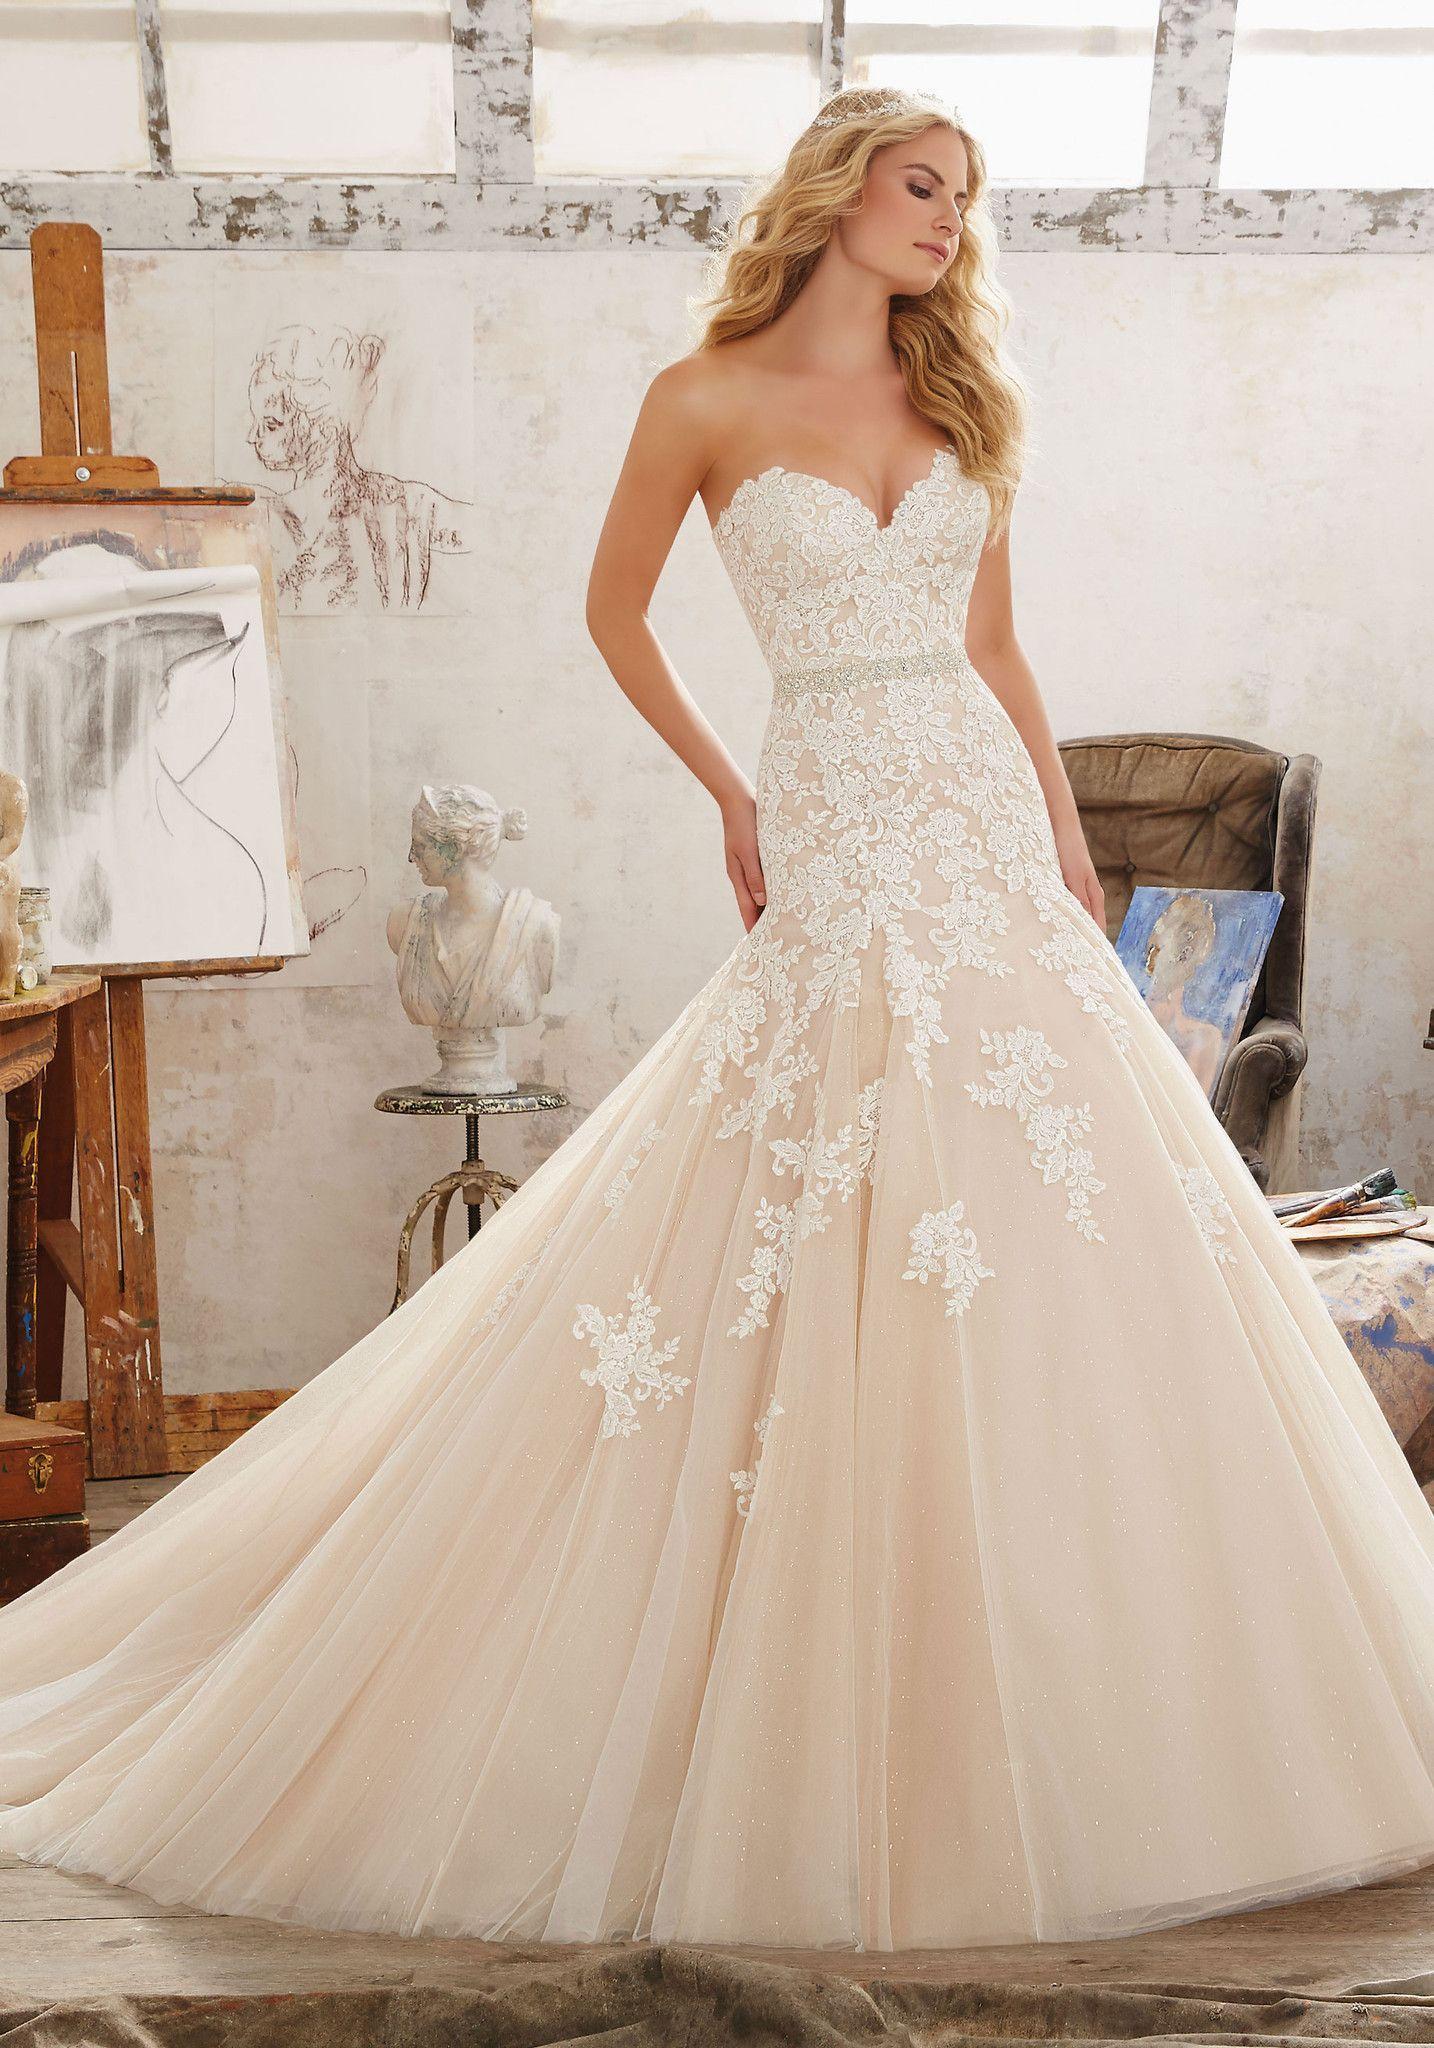 Mori Lee - Mackenzie - 8101 - All Dressed Up, Bridal Gown | Wedding ...